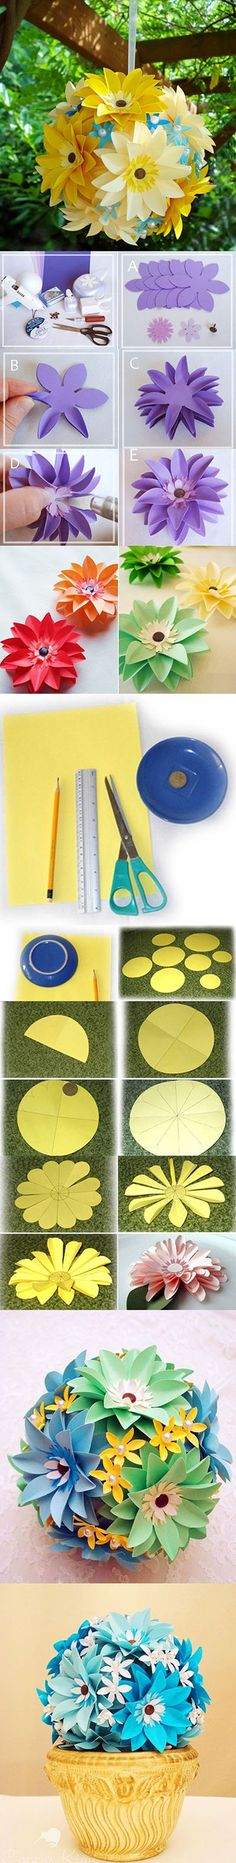 DIY Easy Paper Flower Ball in 2 Ways | DIY & Crafts Tutorials